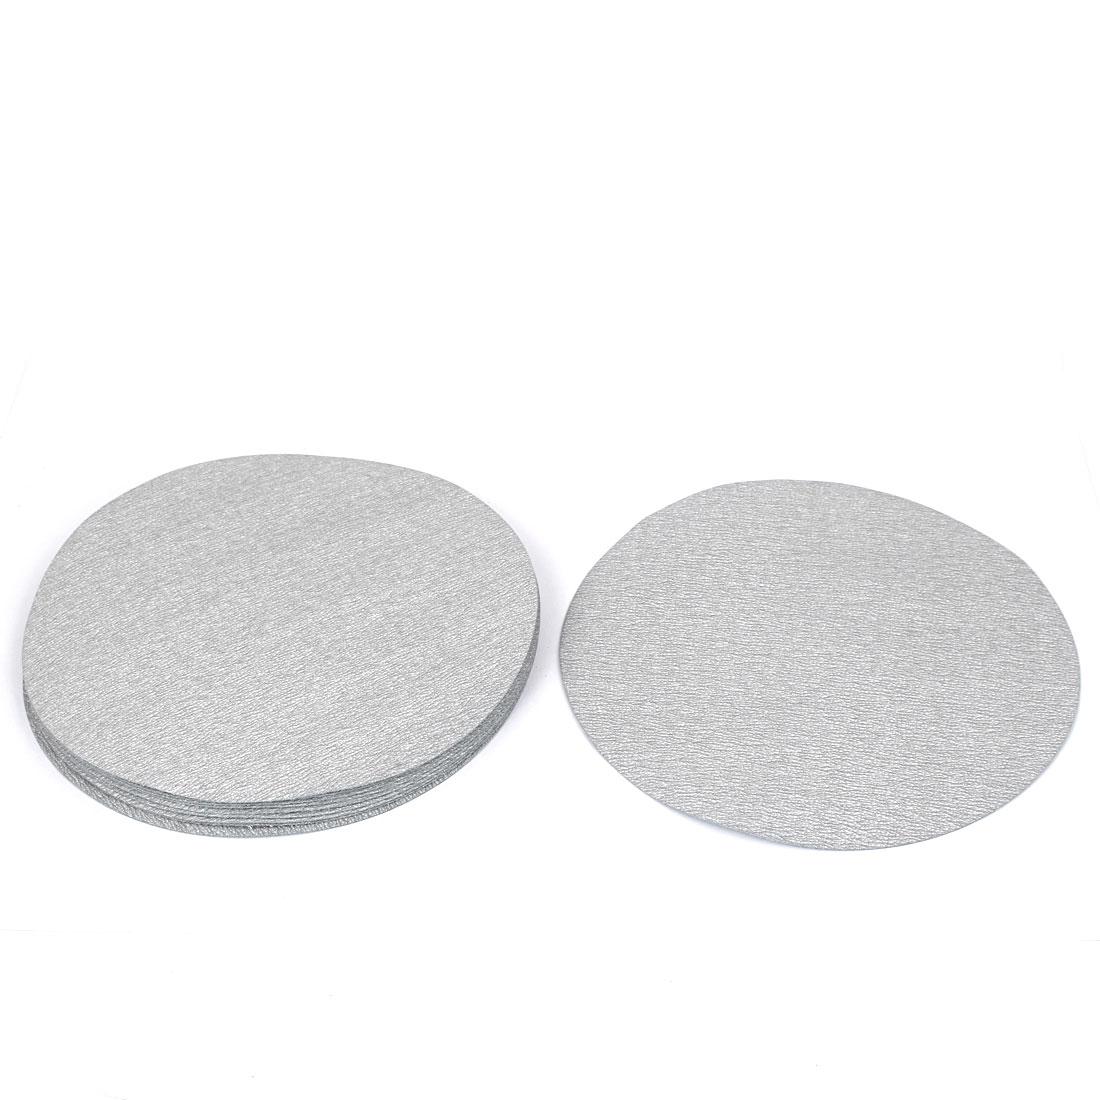 7inch Dia Round Dry Abrasive Sanding Flocking Sandpaper Disc 800 Grit 10pcs